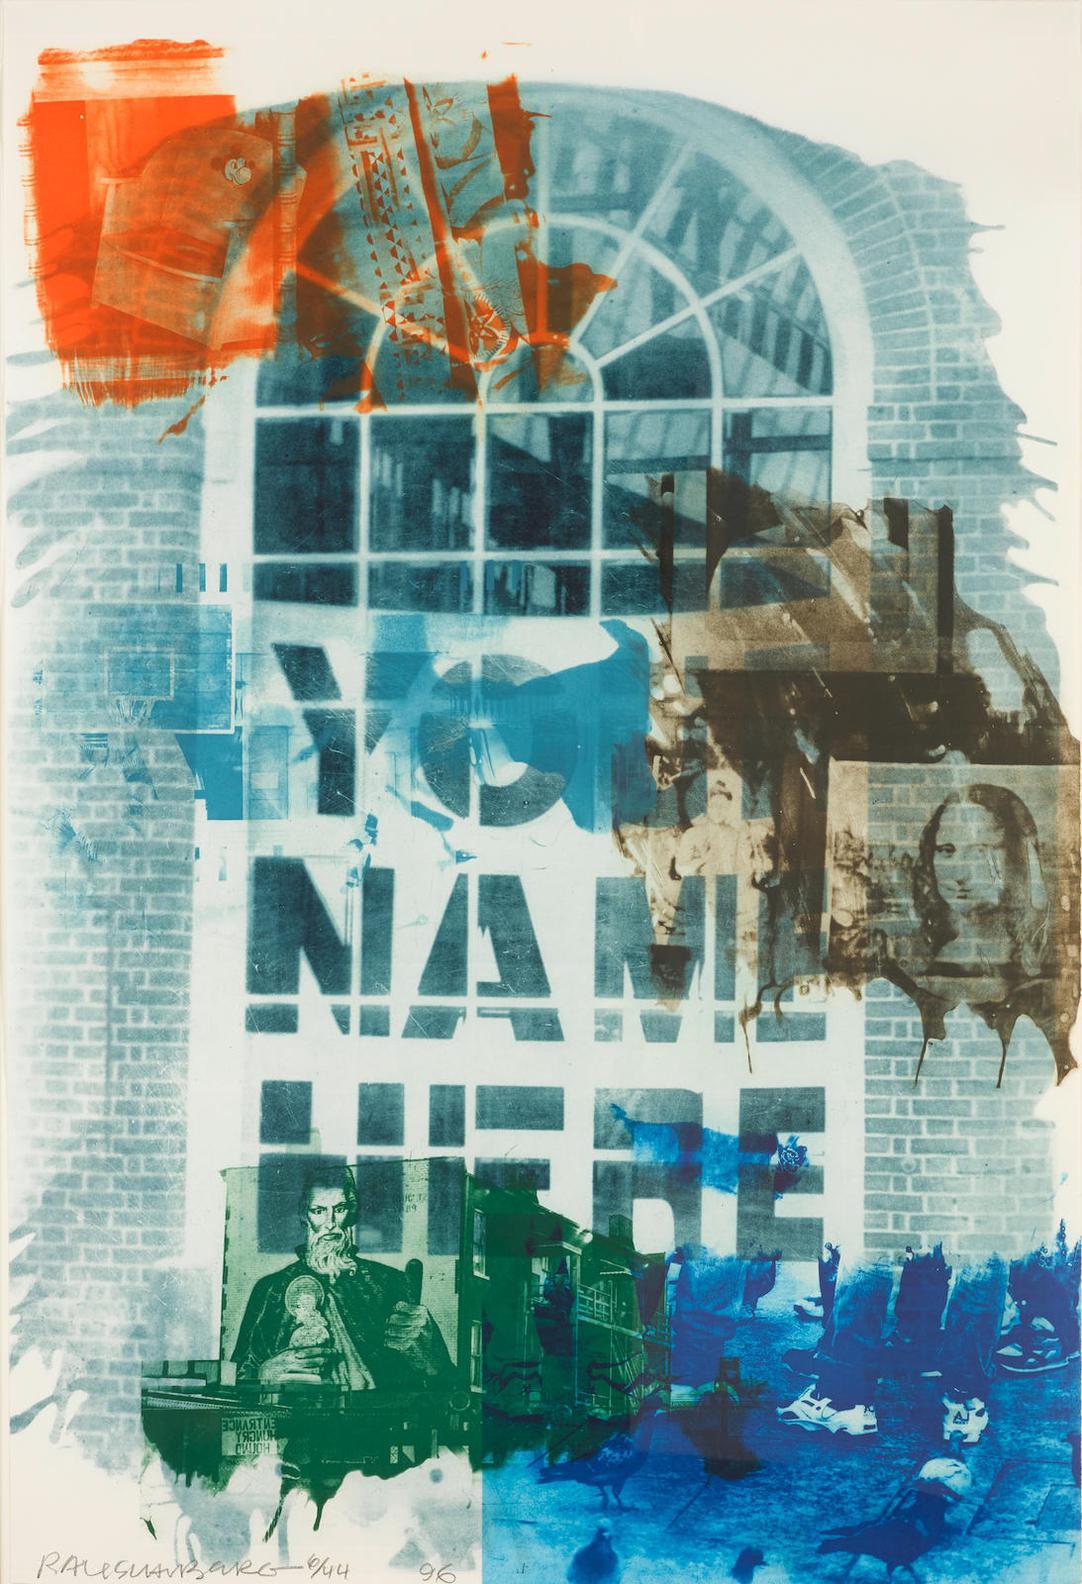 Robert Rauschenberg-Banco, From Ground Rules-1996